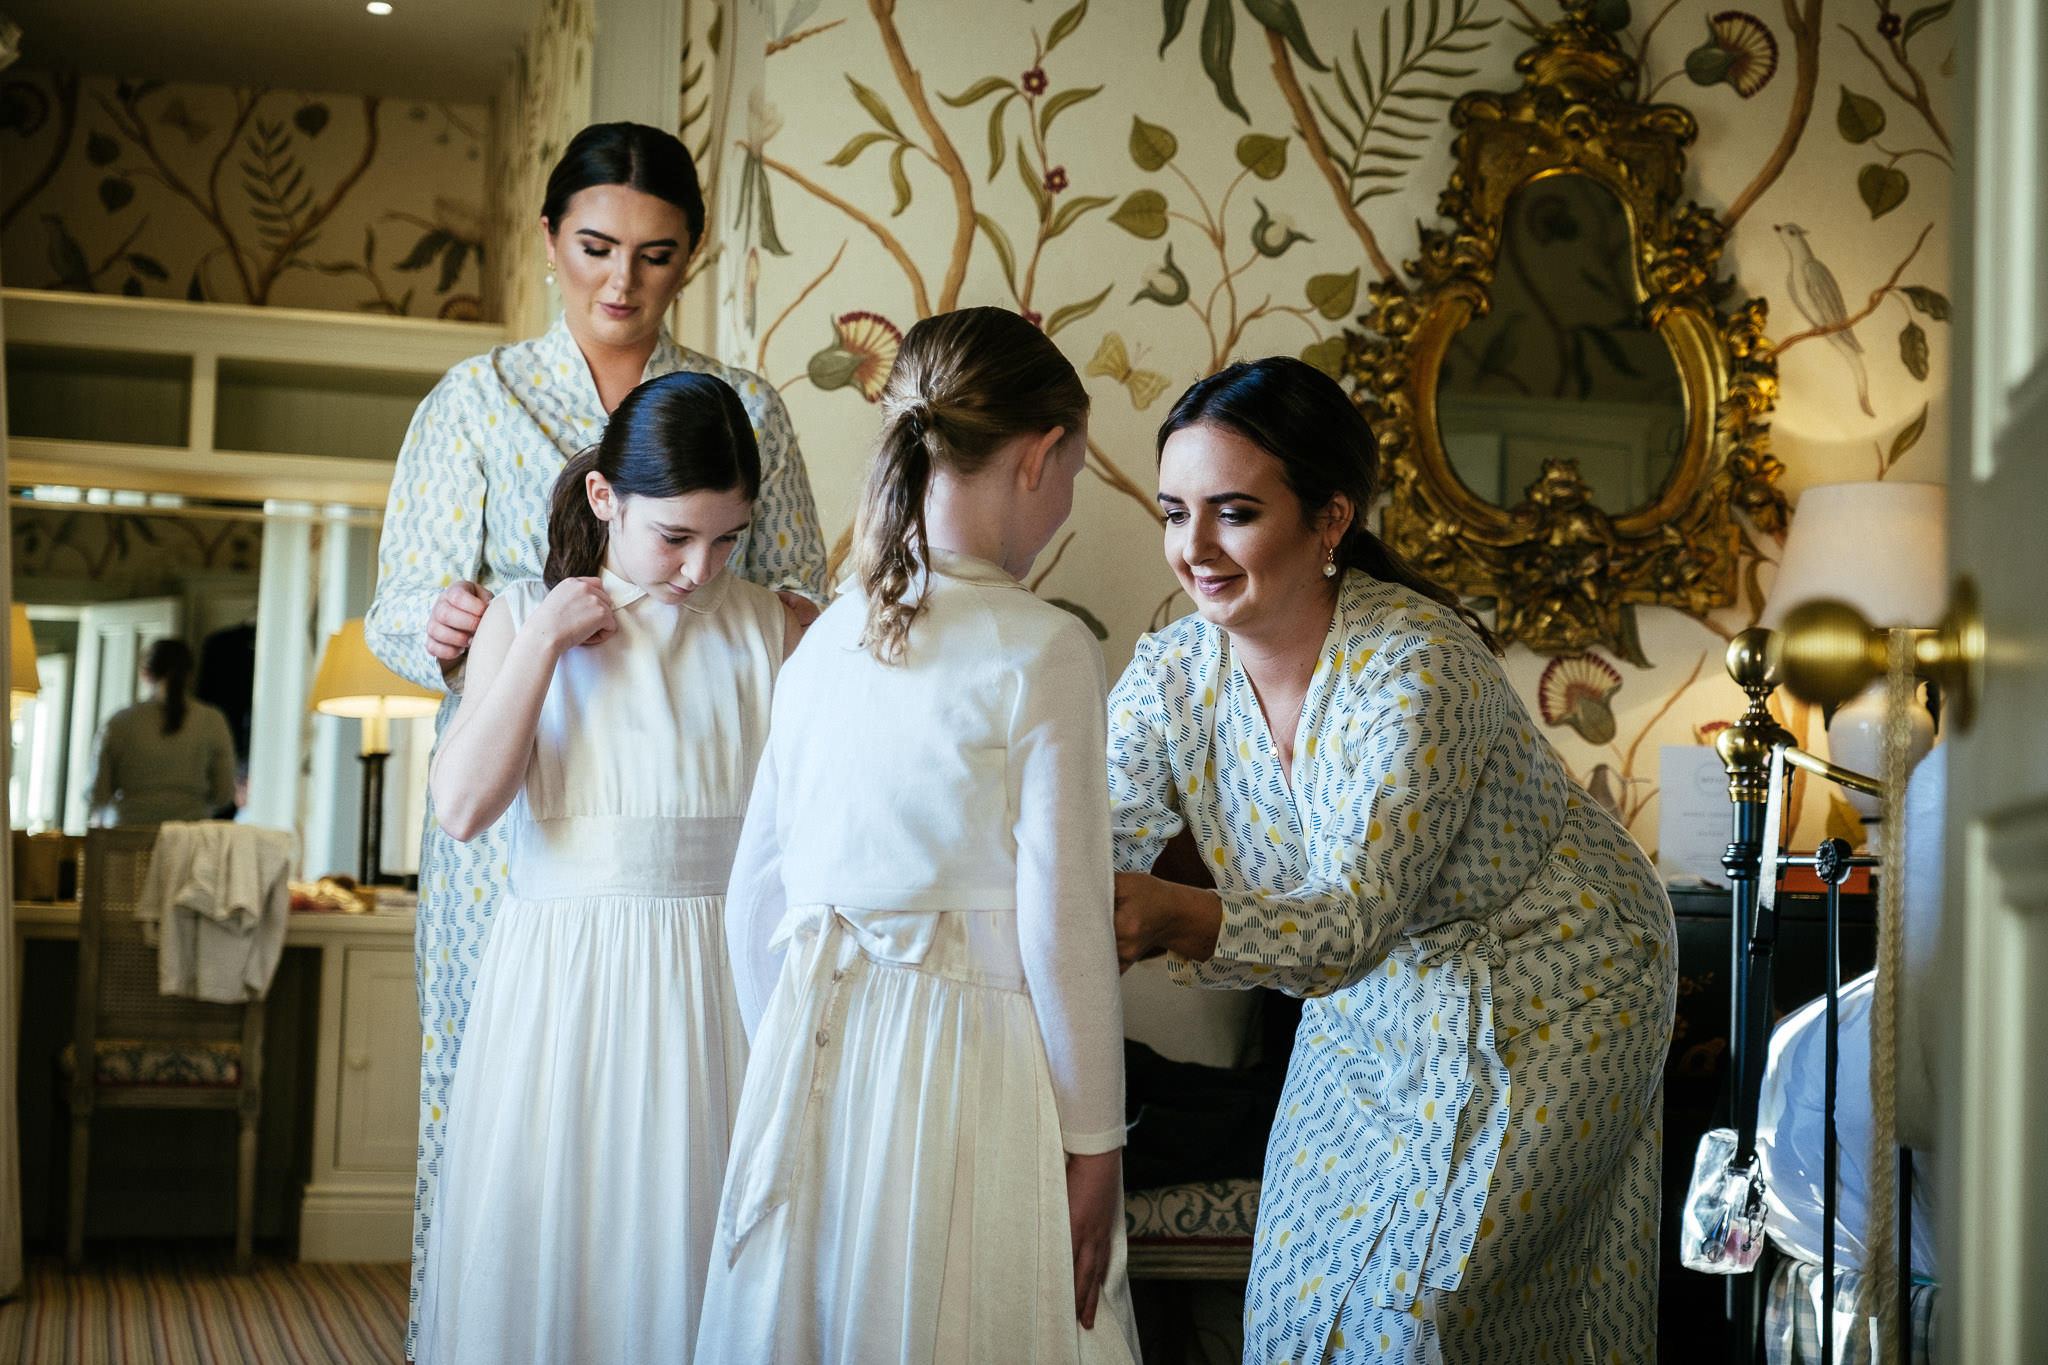 flowergirls getting dressed at virginia park lodge wedding